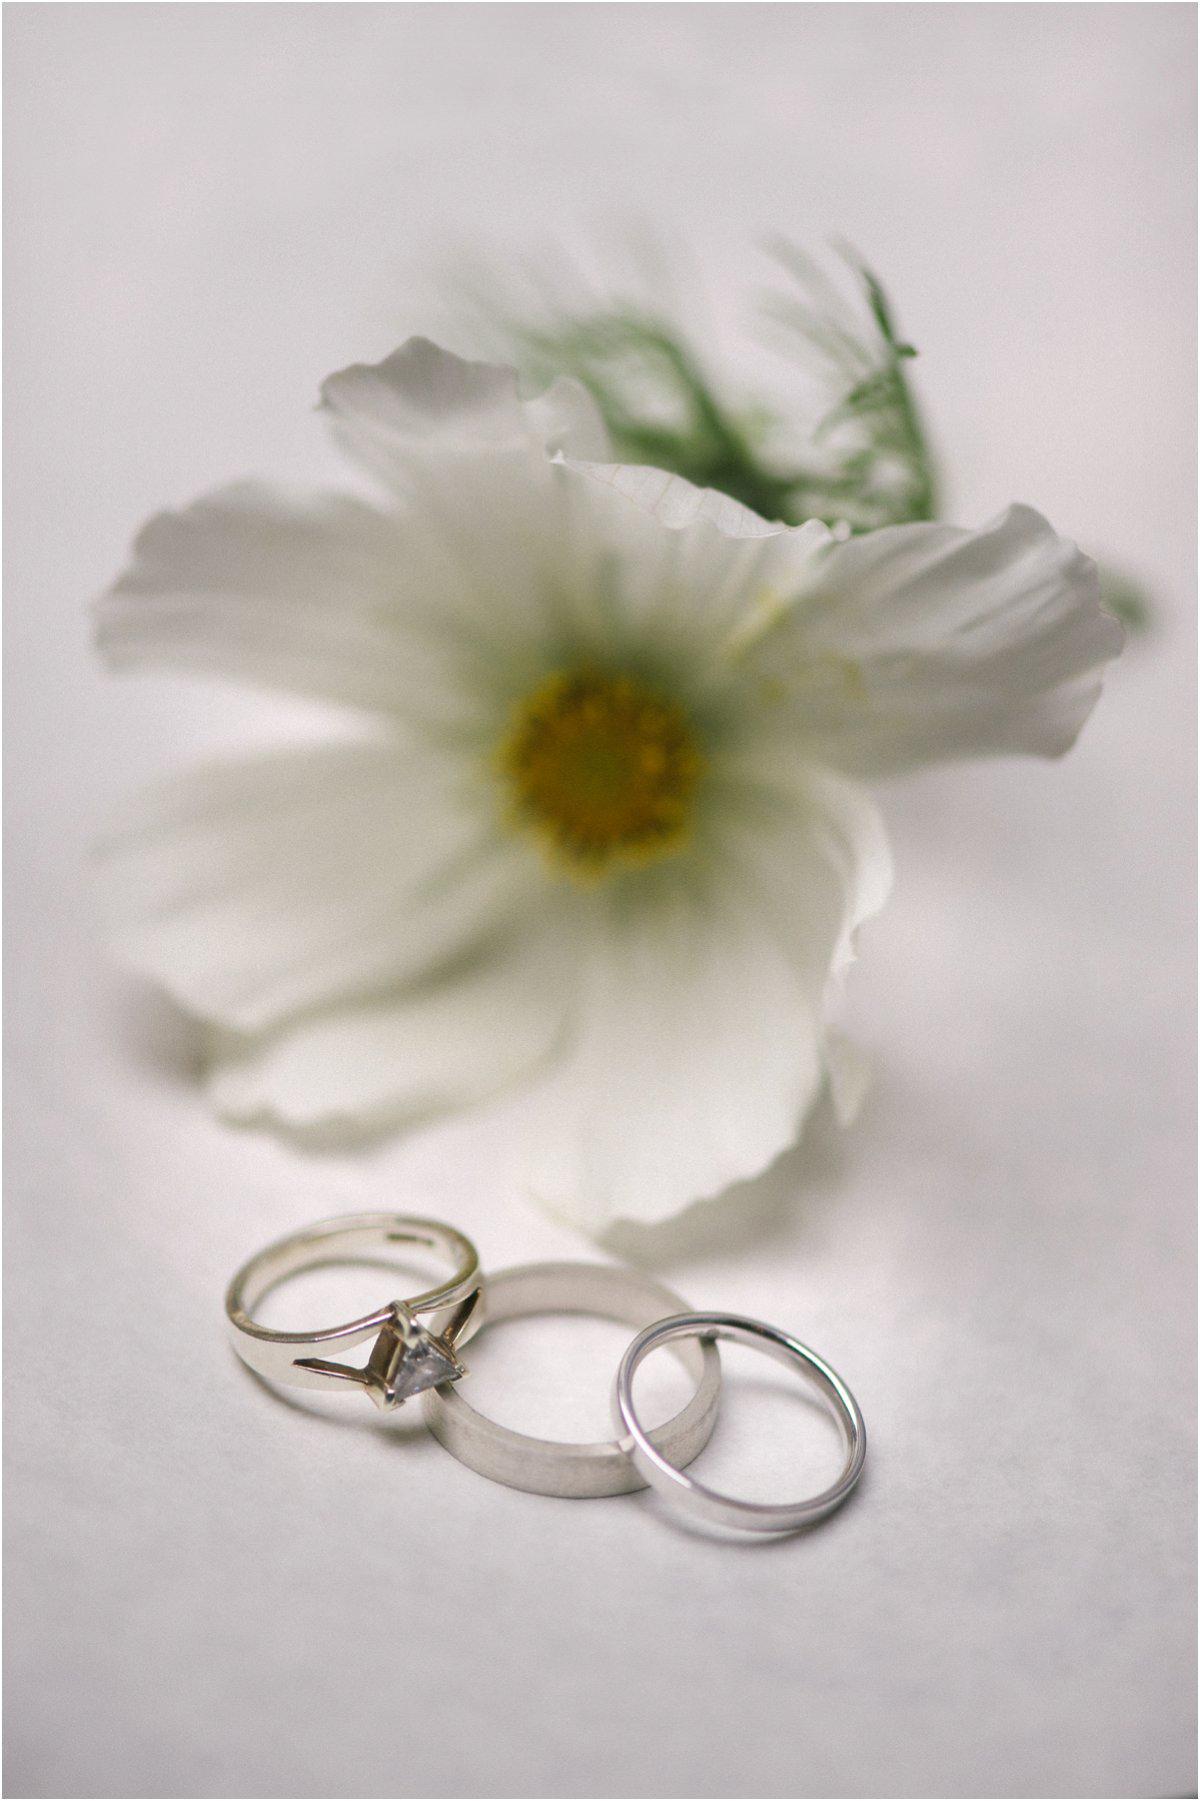 Crofts & Kowalczyk Best Wedding Photography Scotland Blogpost.jpg